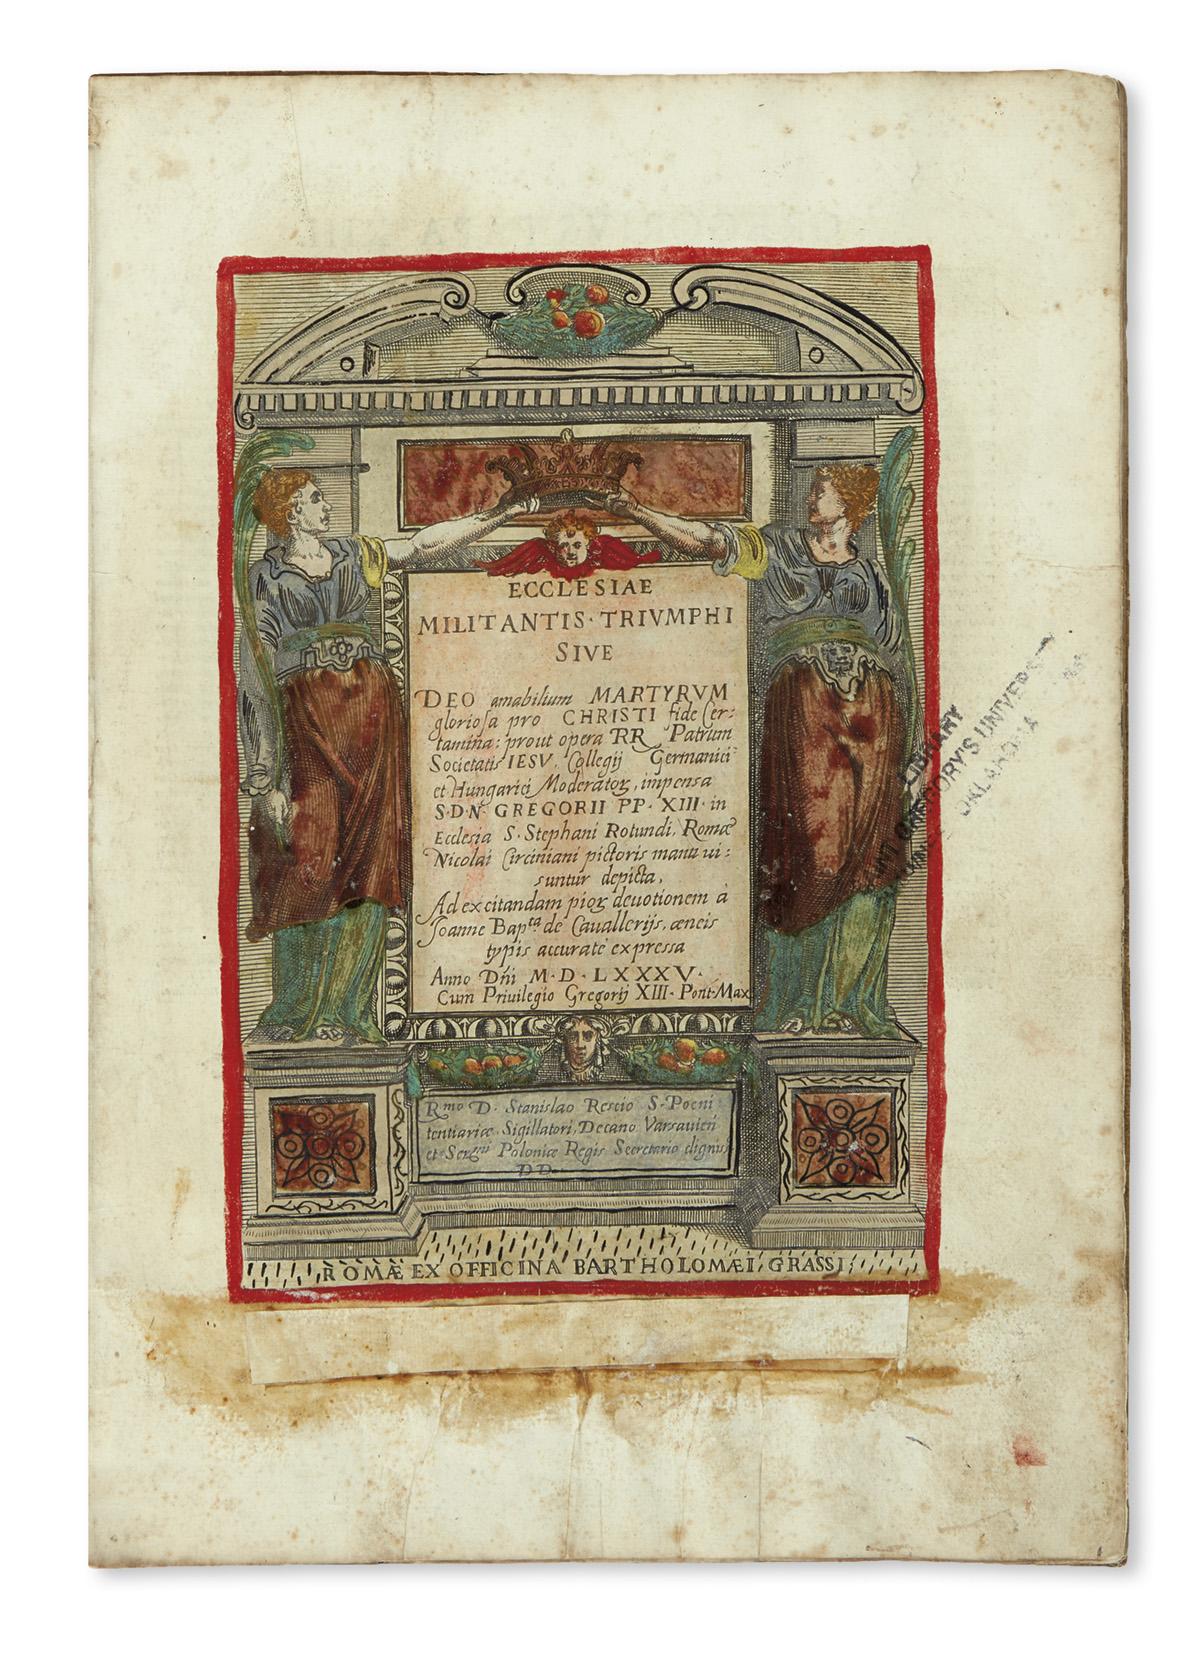 CIRCIGNANI, NICCOLÒ. Ecclesiae militantis triumphi.  1585.  Hand-colored copy.